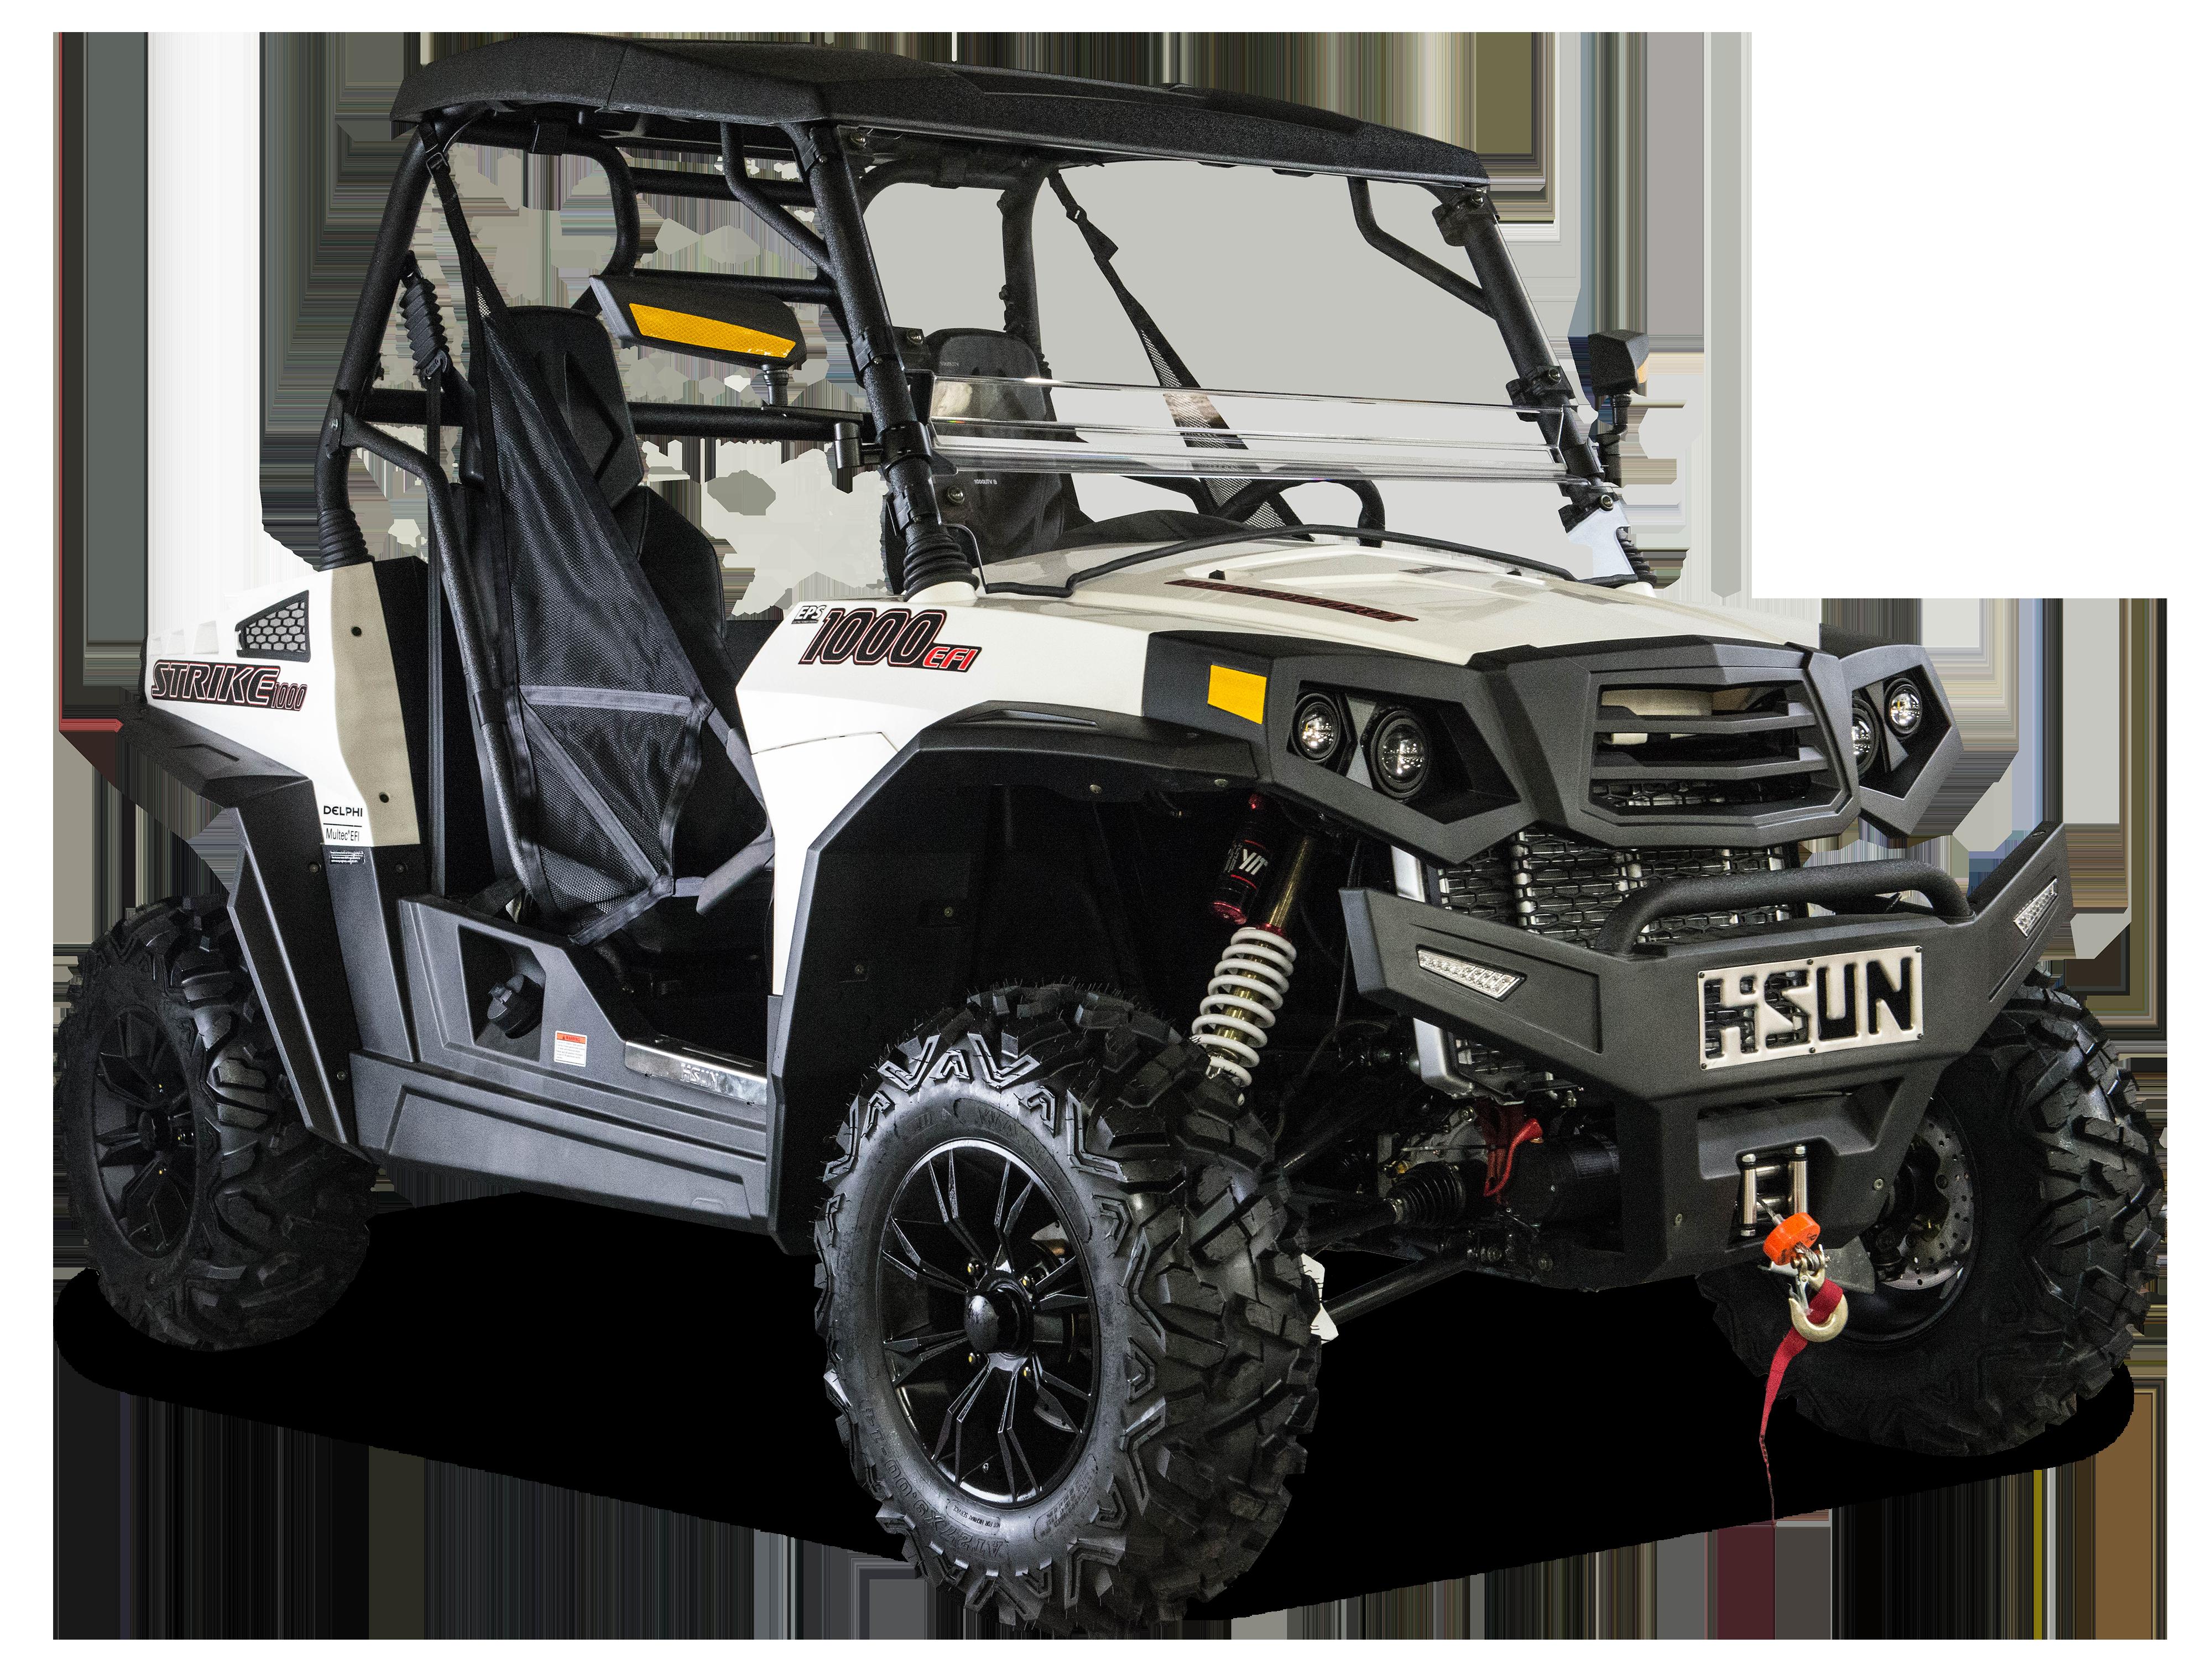 vector royalty free Hisun motors strike year. Vector 500 4wd winch